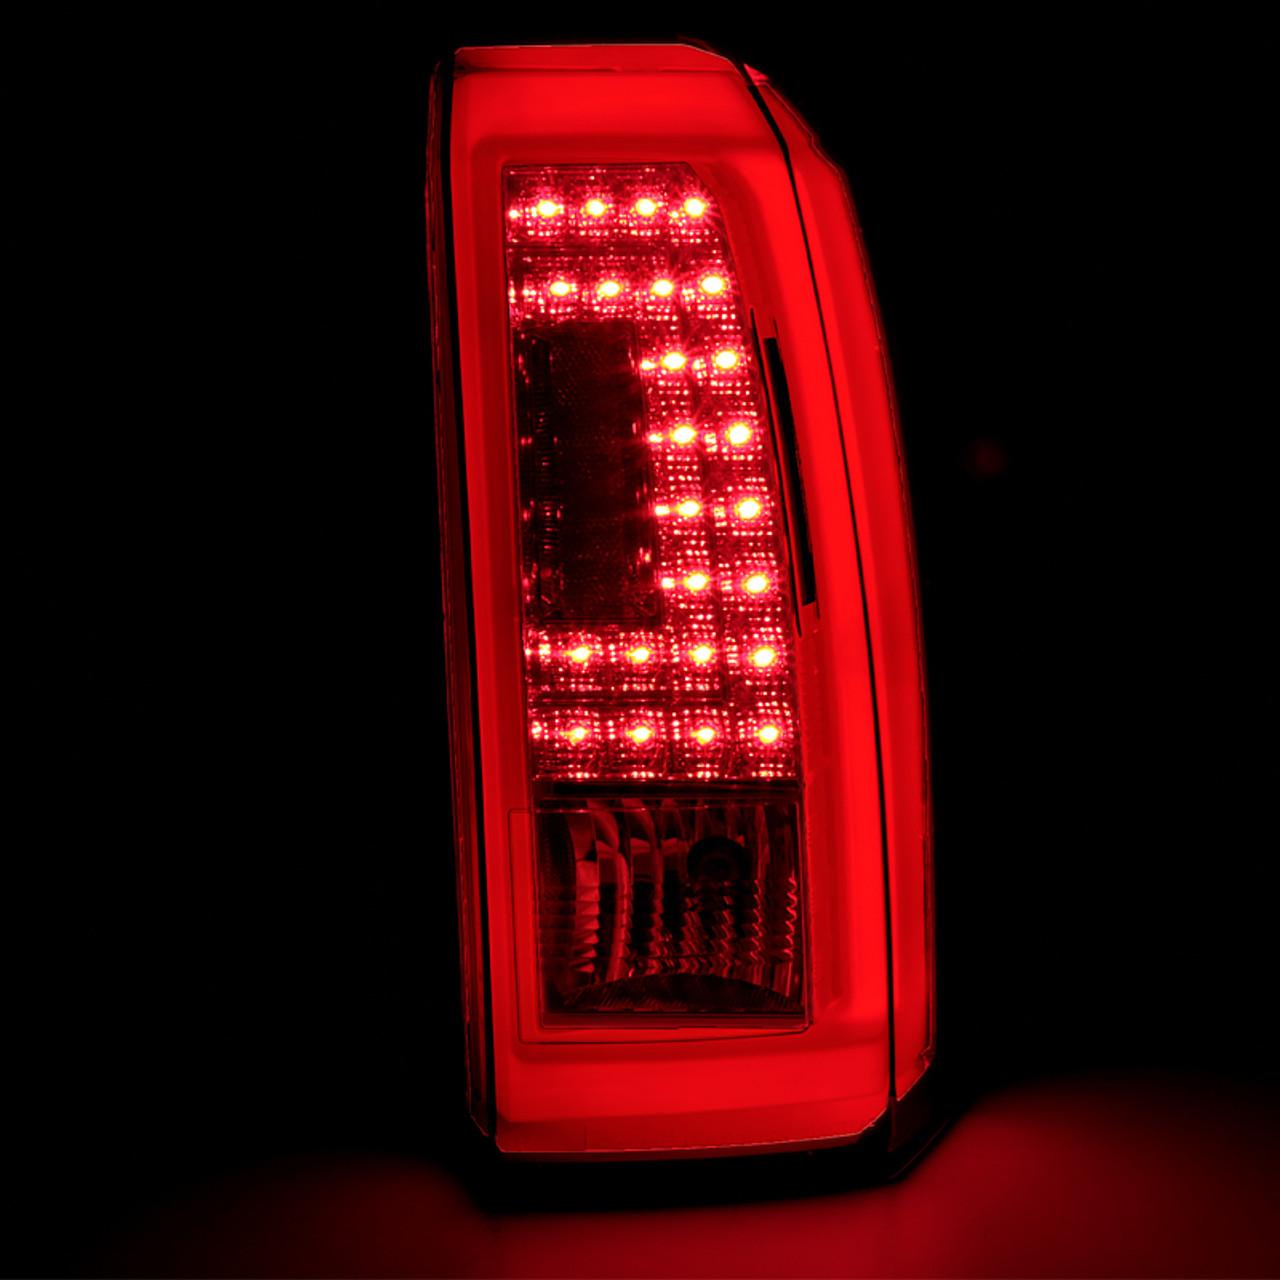 2015 2018 Gmc Yukon Yukon Xl Denali Sle Slt Led Tail Lights Chrome Housing Red Smoke Lens Spec D Tuning